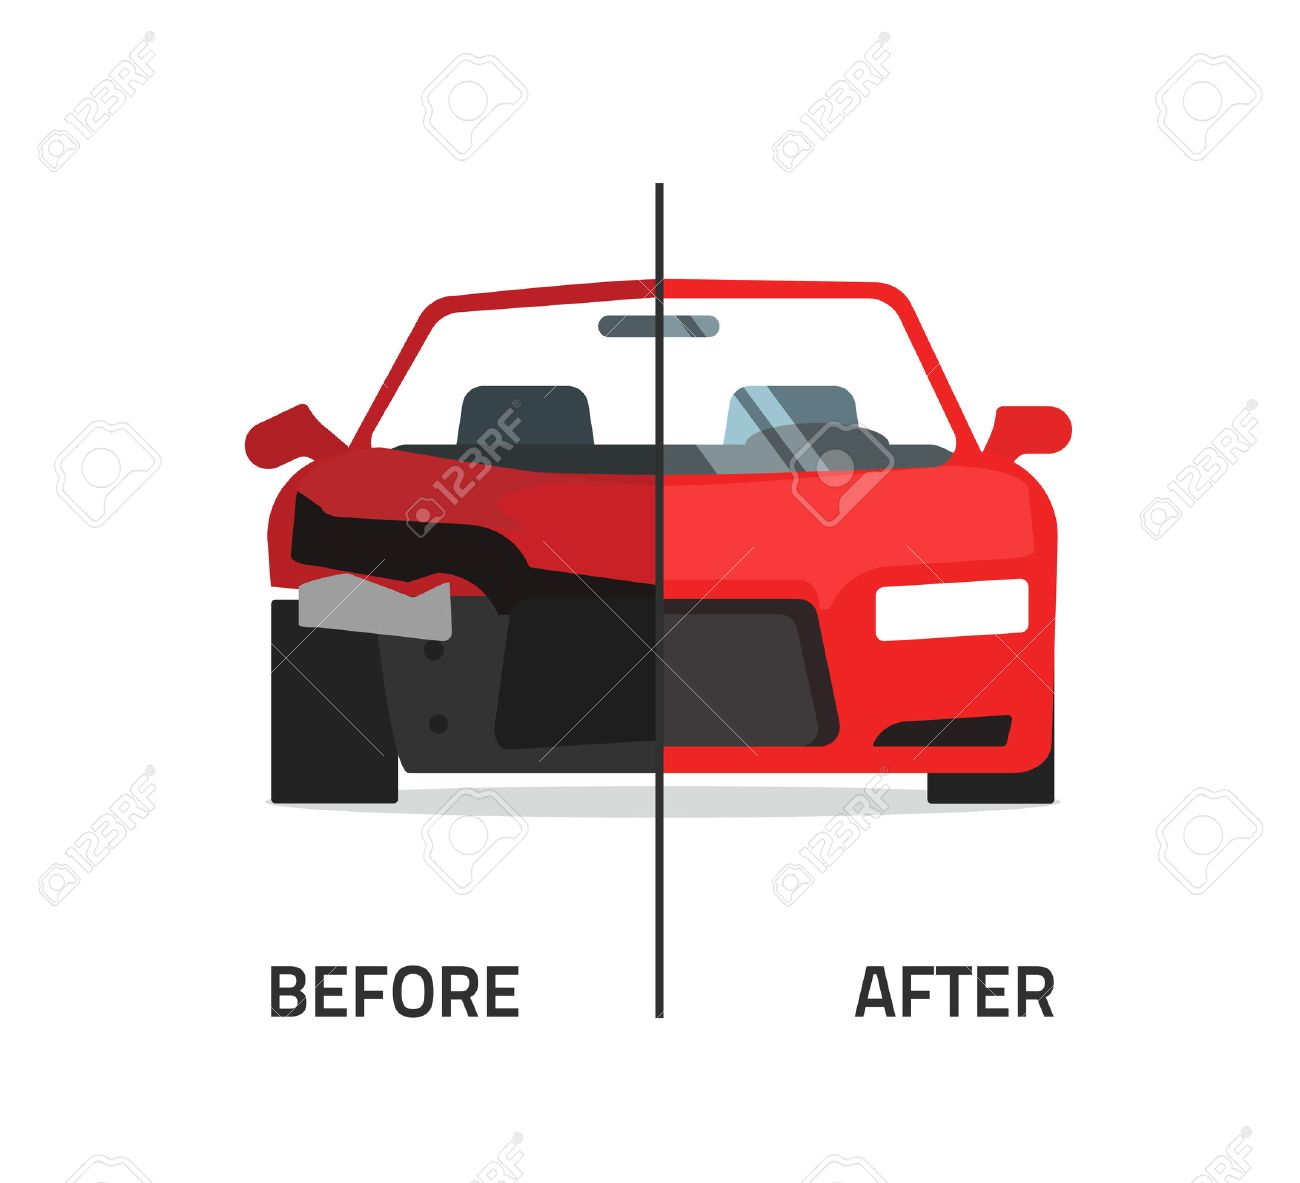 Auto-Karosserierahmen Reparatur Vektor-Illustration, Autokörperfarbe ...